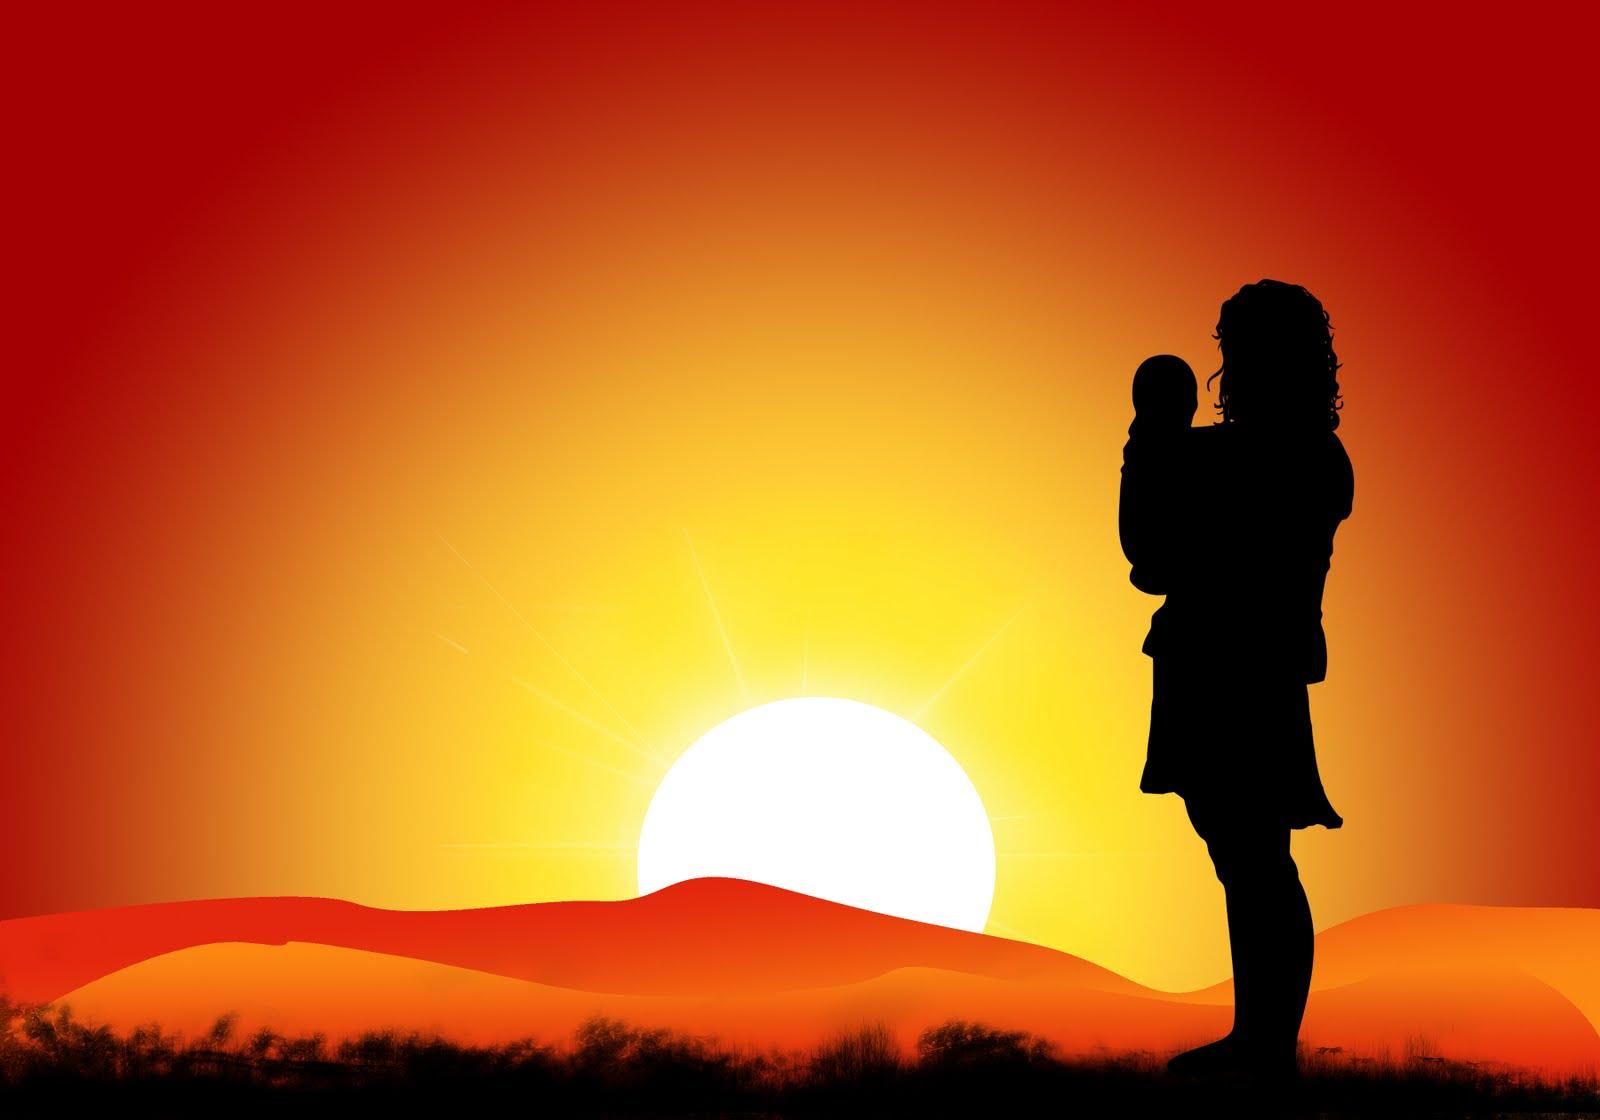 Mother And Child 3562 Mi9 Wallpaper Ferrebeekeeper Ferrebeekeeperwordpress Tag